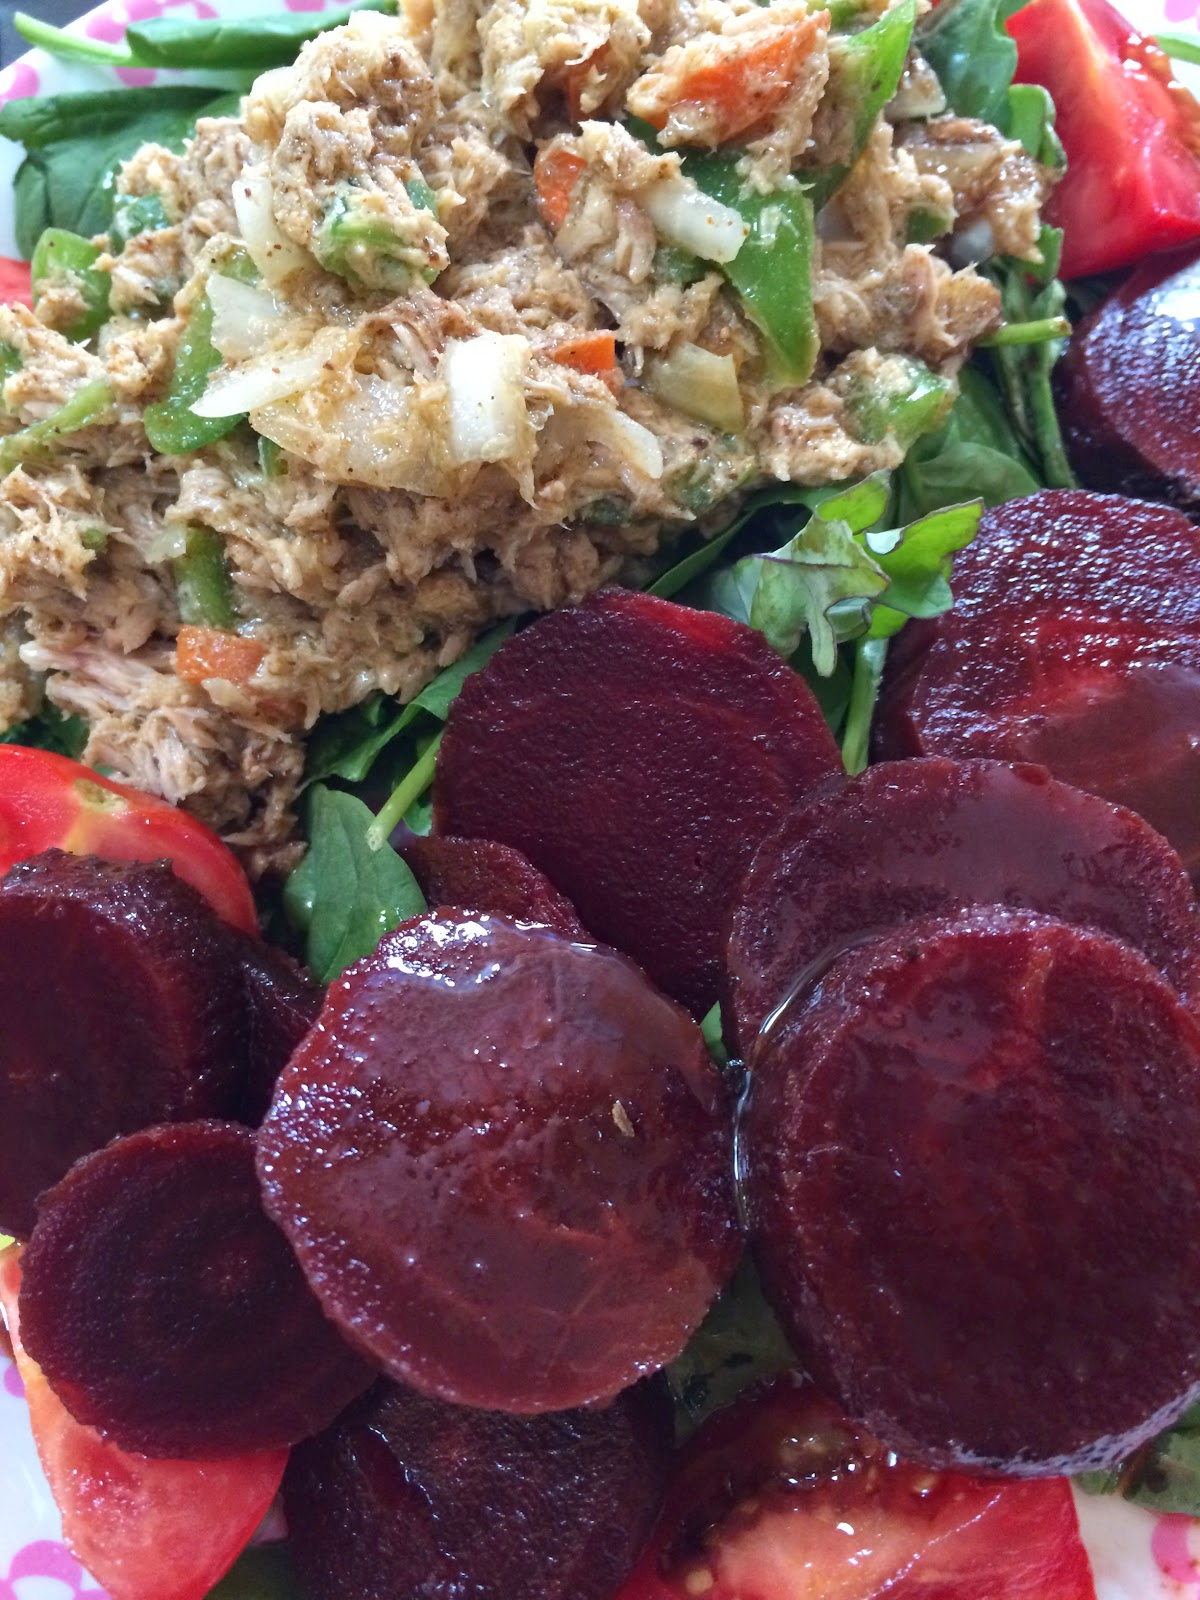 Mayo-less tuna salad, Love Beets and pasta with anchovies